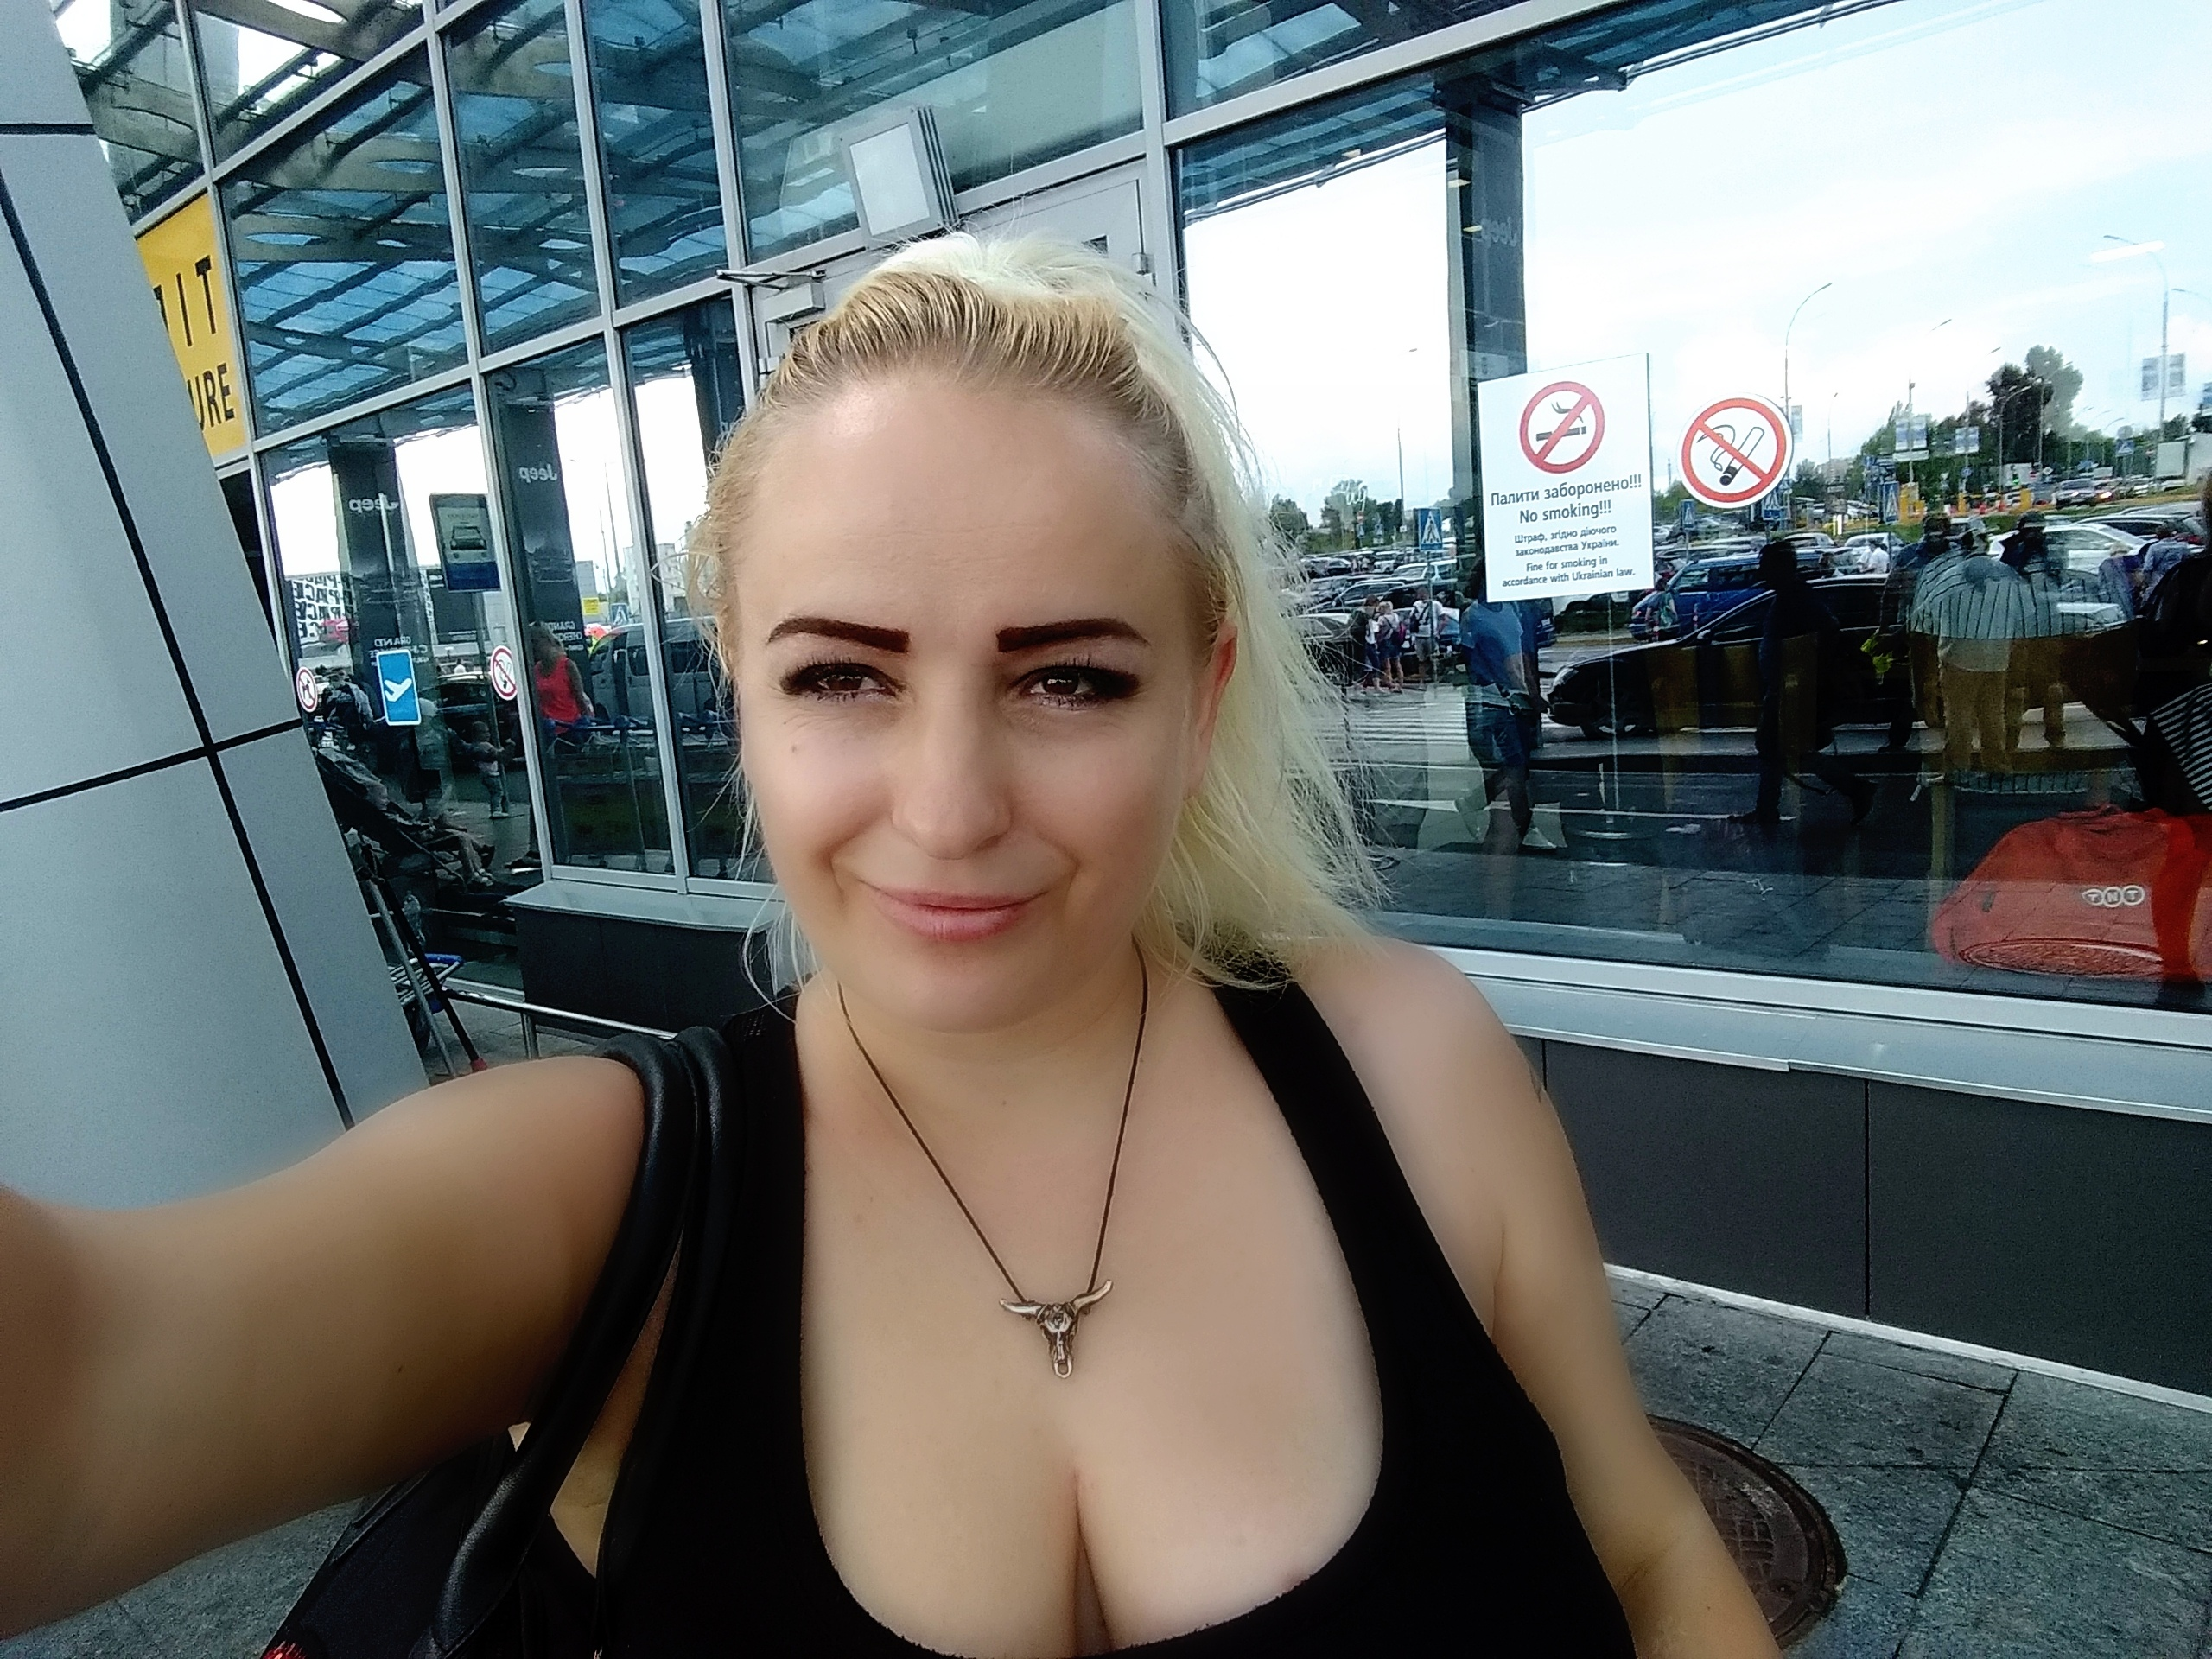 Елена Руденко (Валтея). Украина. Киев. Фото и описание.  P5_bk96tHAI